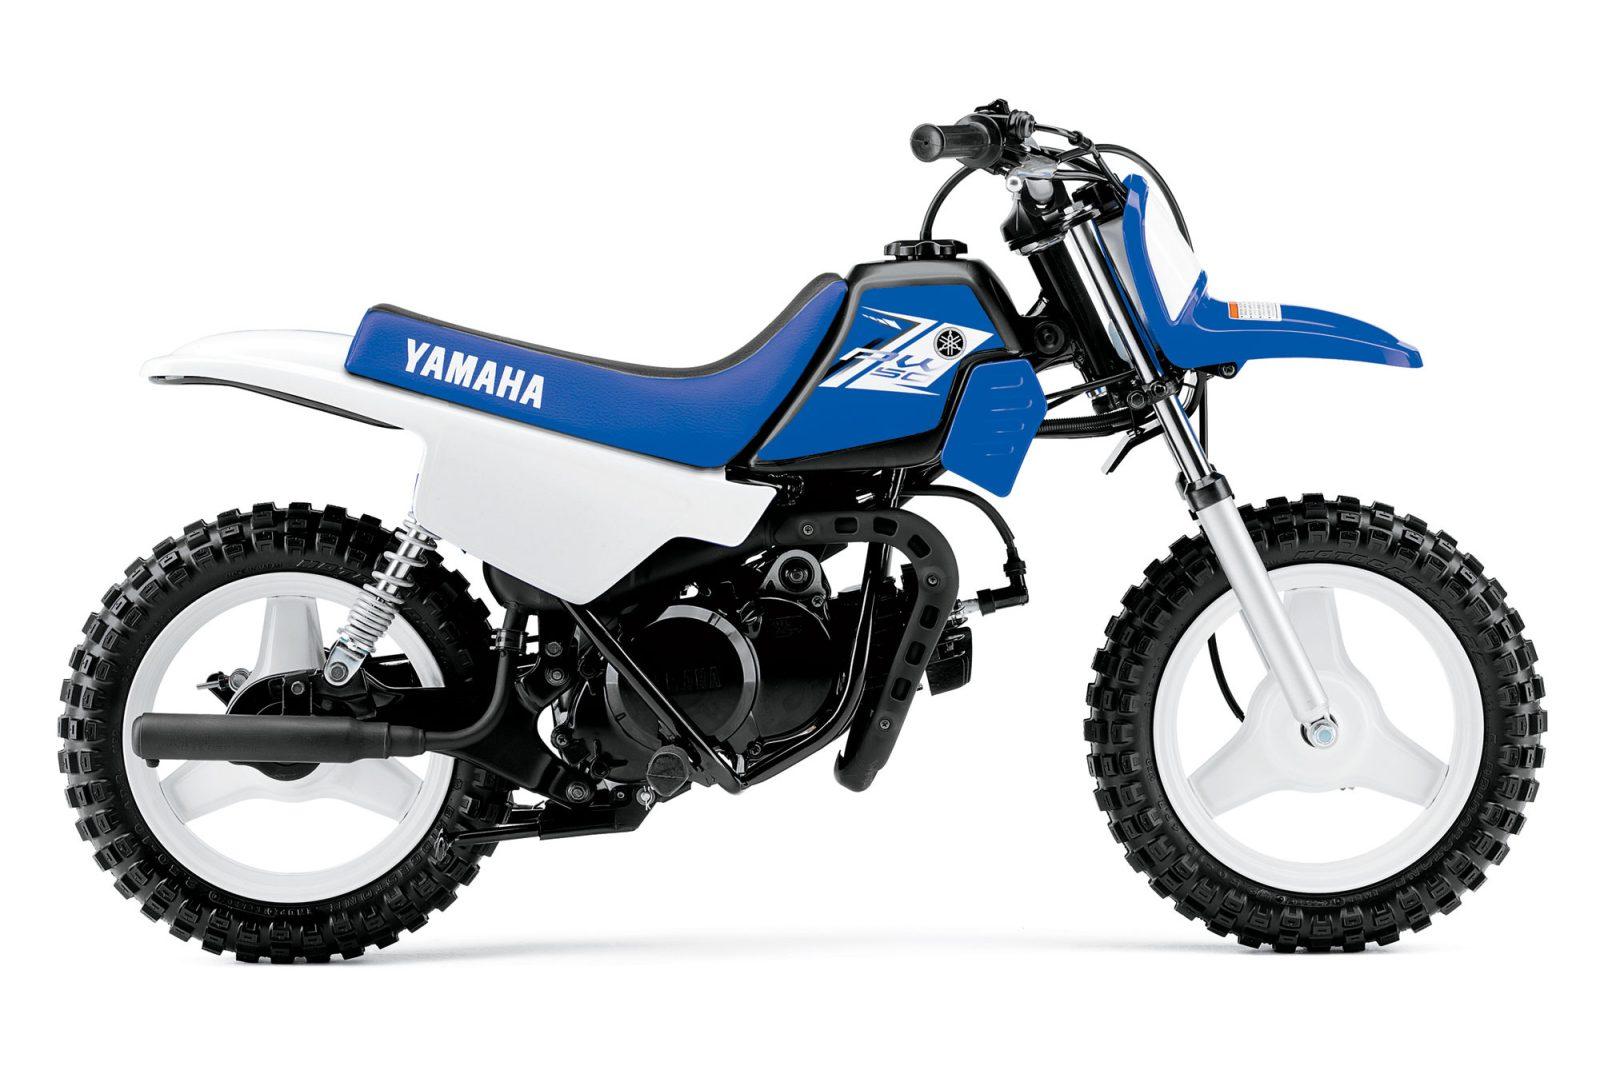 USED BIKE: 2010-2014 Yamaha PW50 - Australasian Dirt Bike